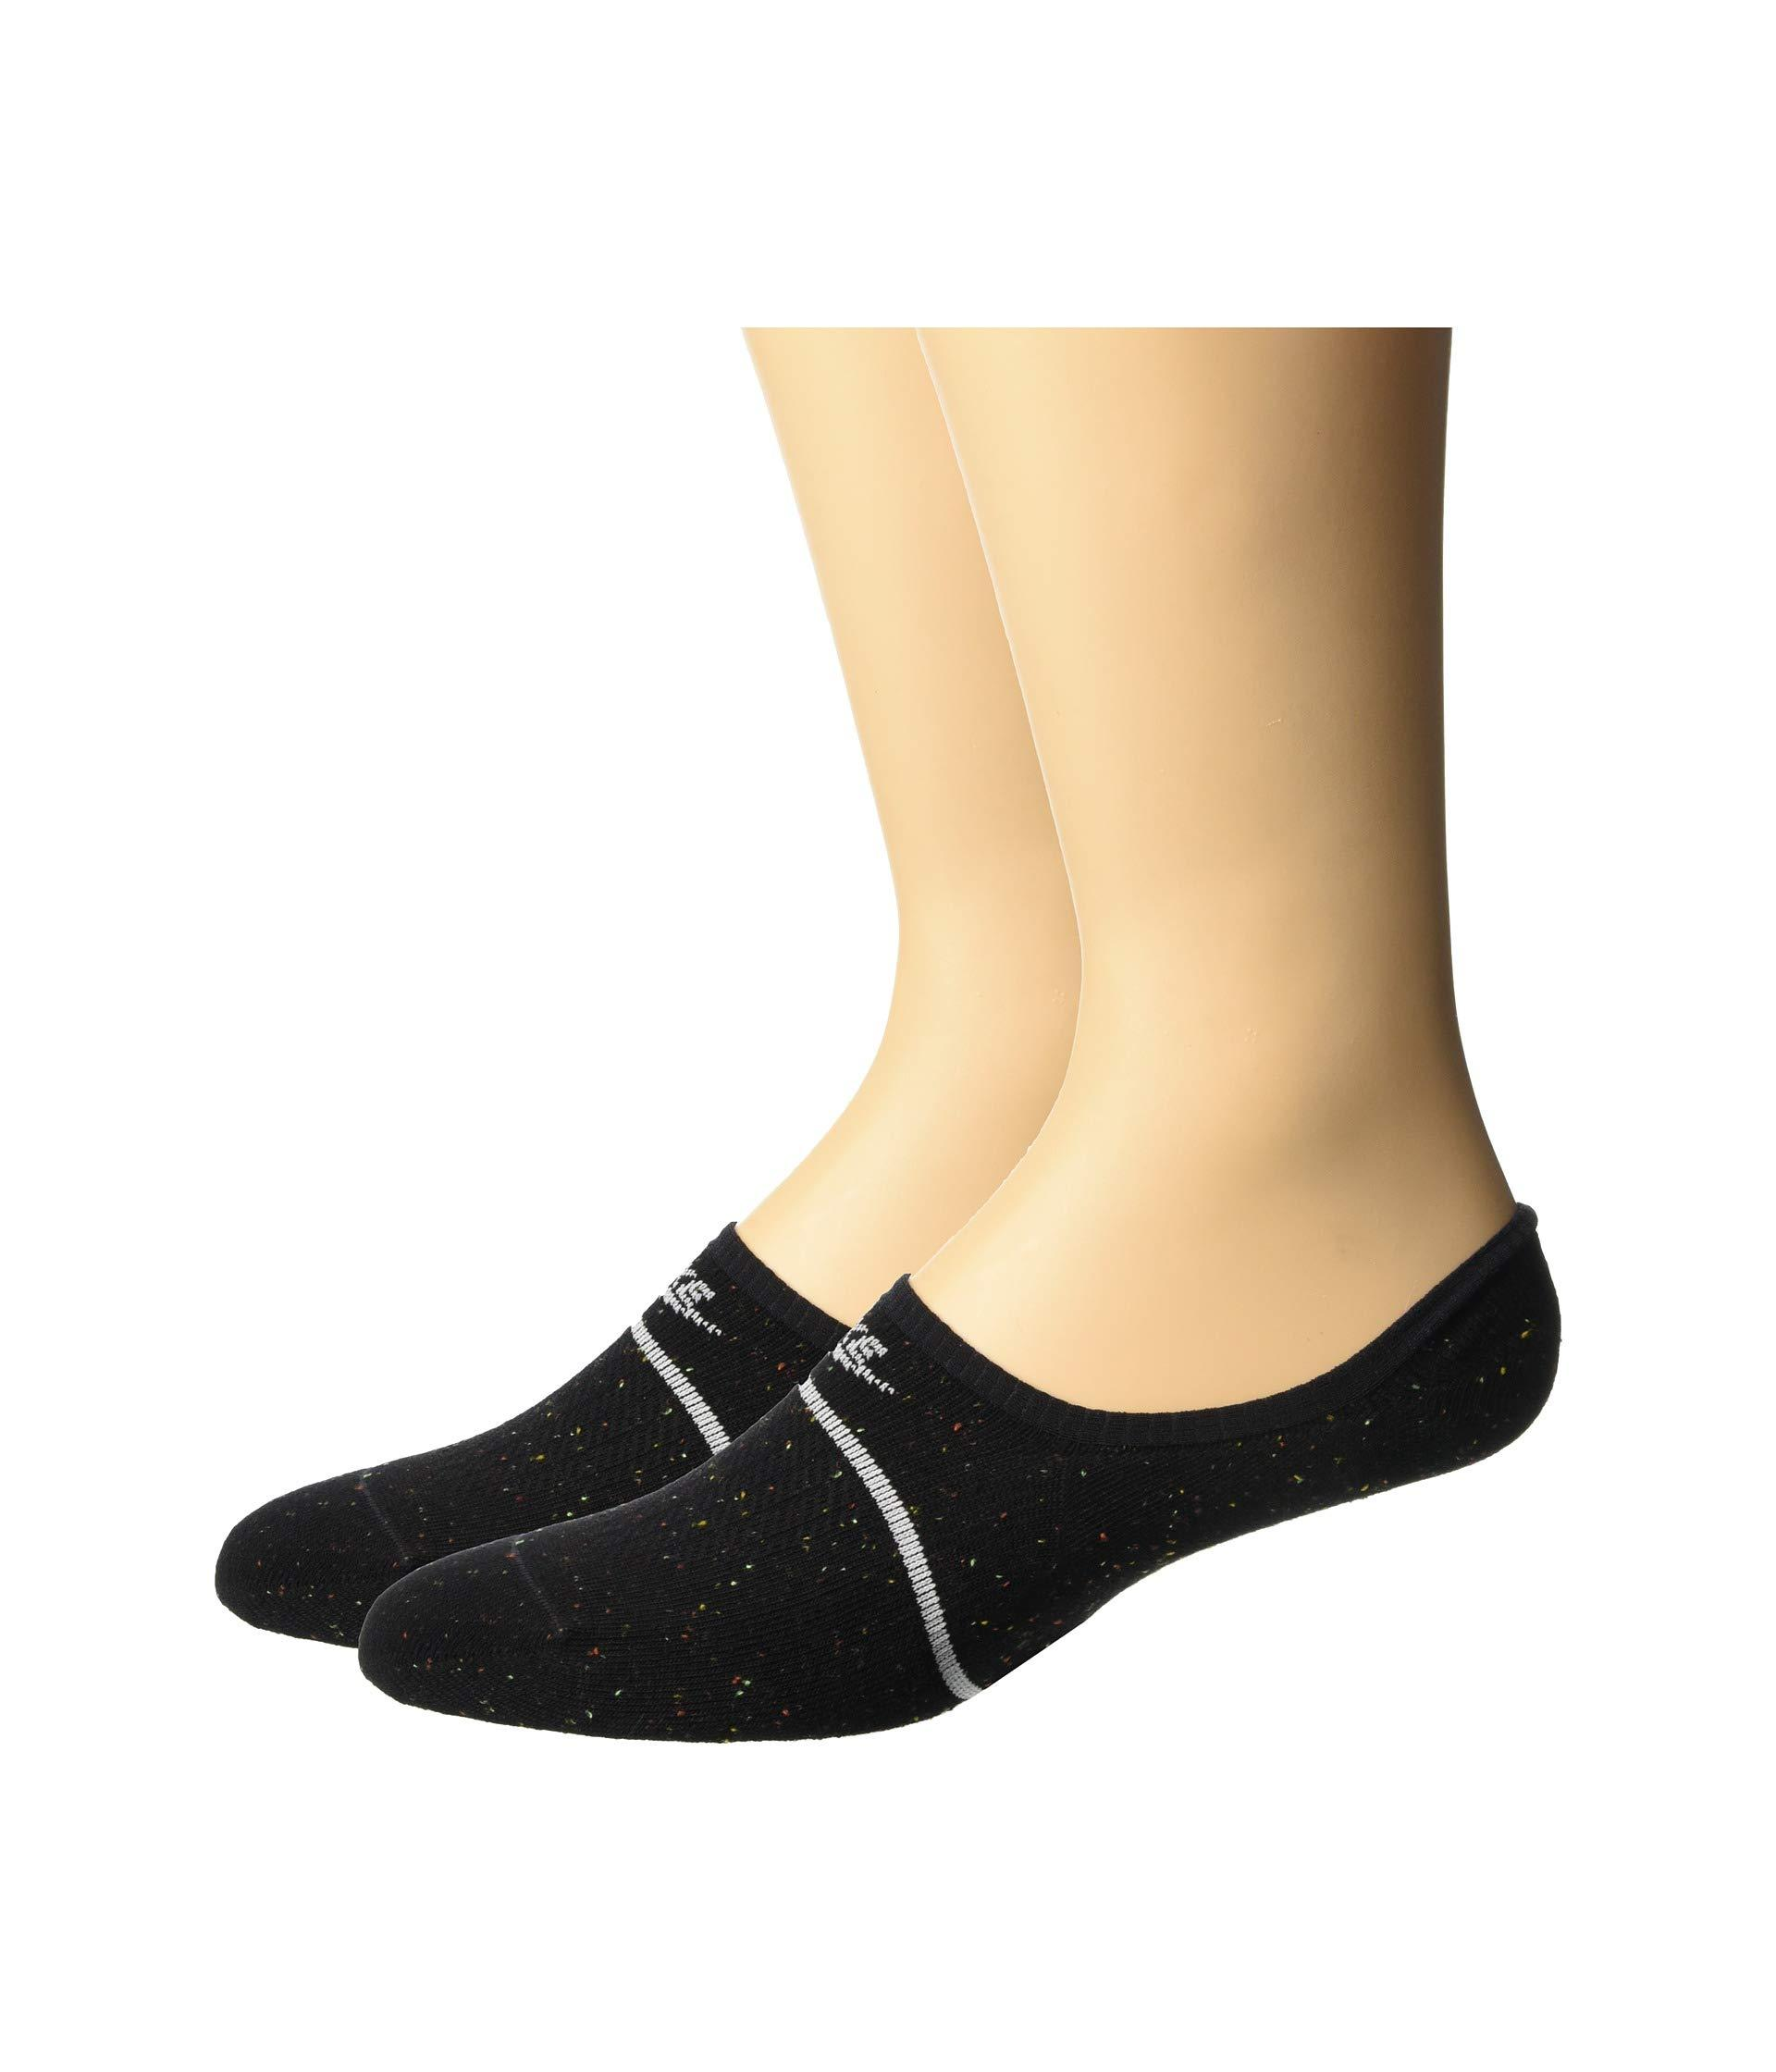 f7f37fa2e Lyst - Nike Sneaker Sox Essential Footie 2-pair Pack (white/black ...